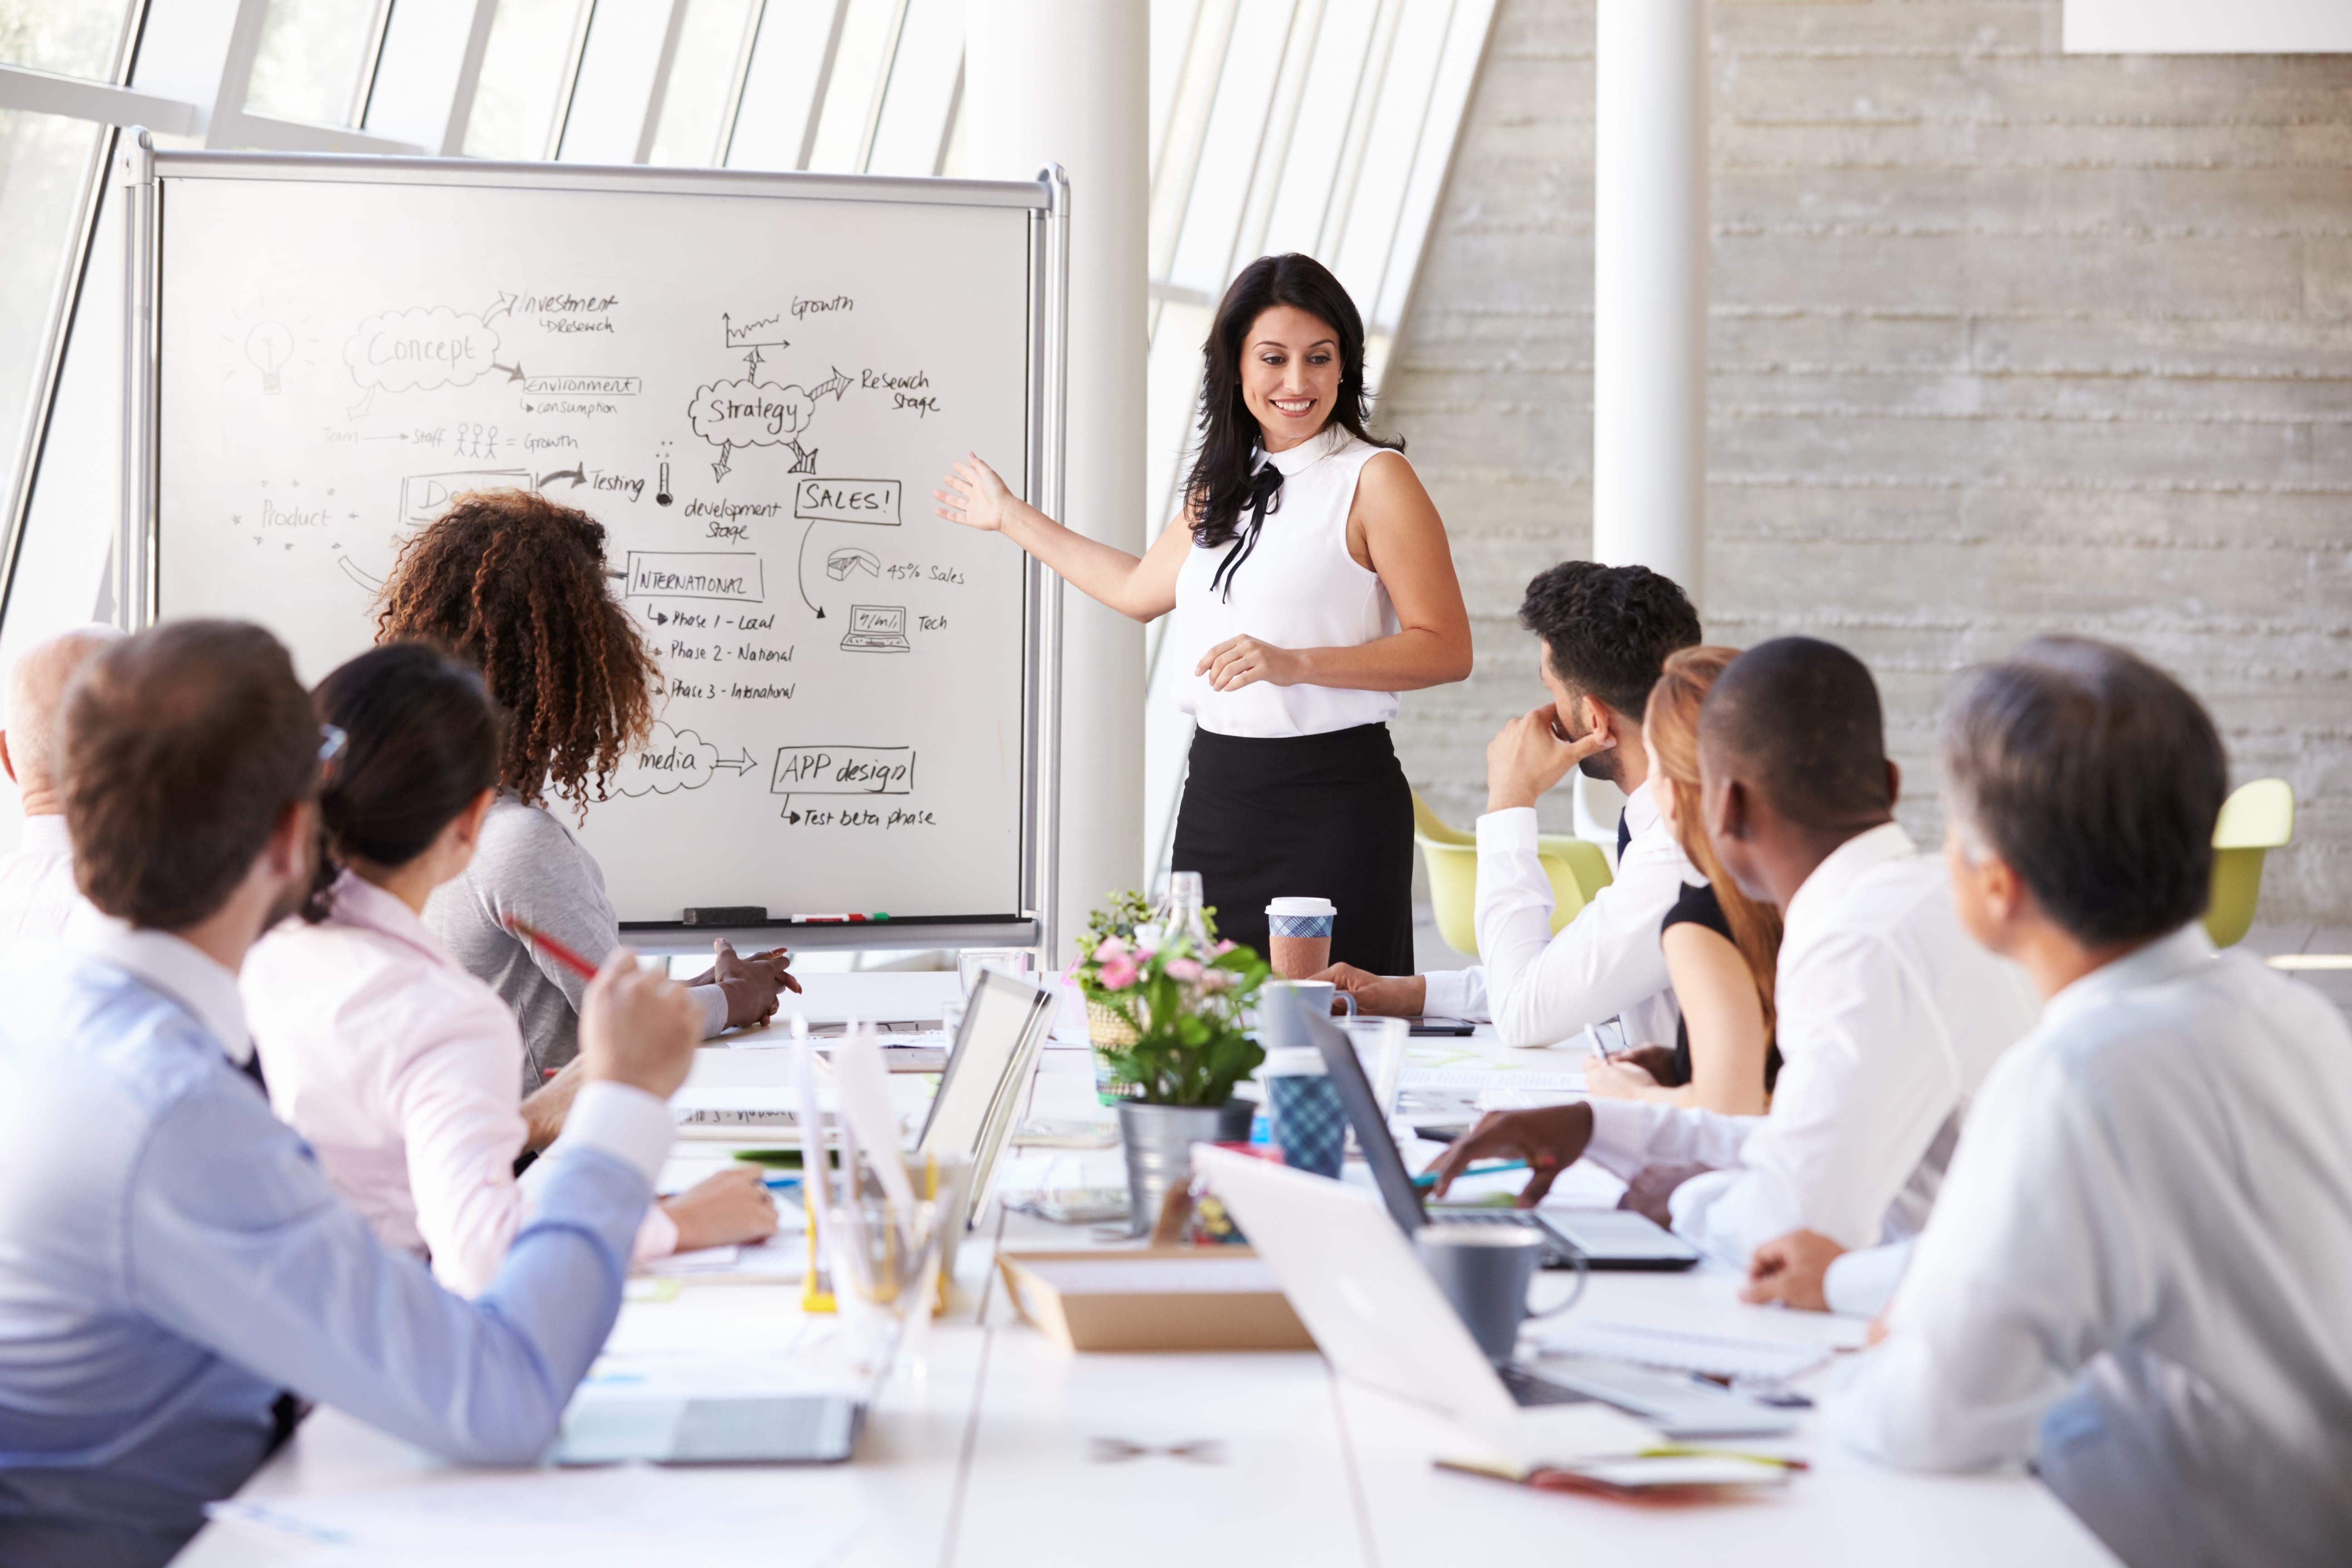 Hispanic Businesswoman Leading Meeting